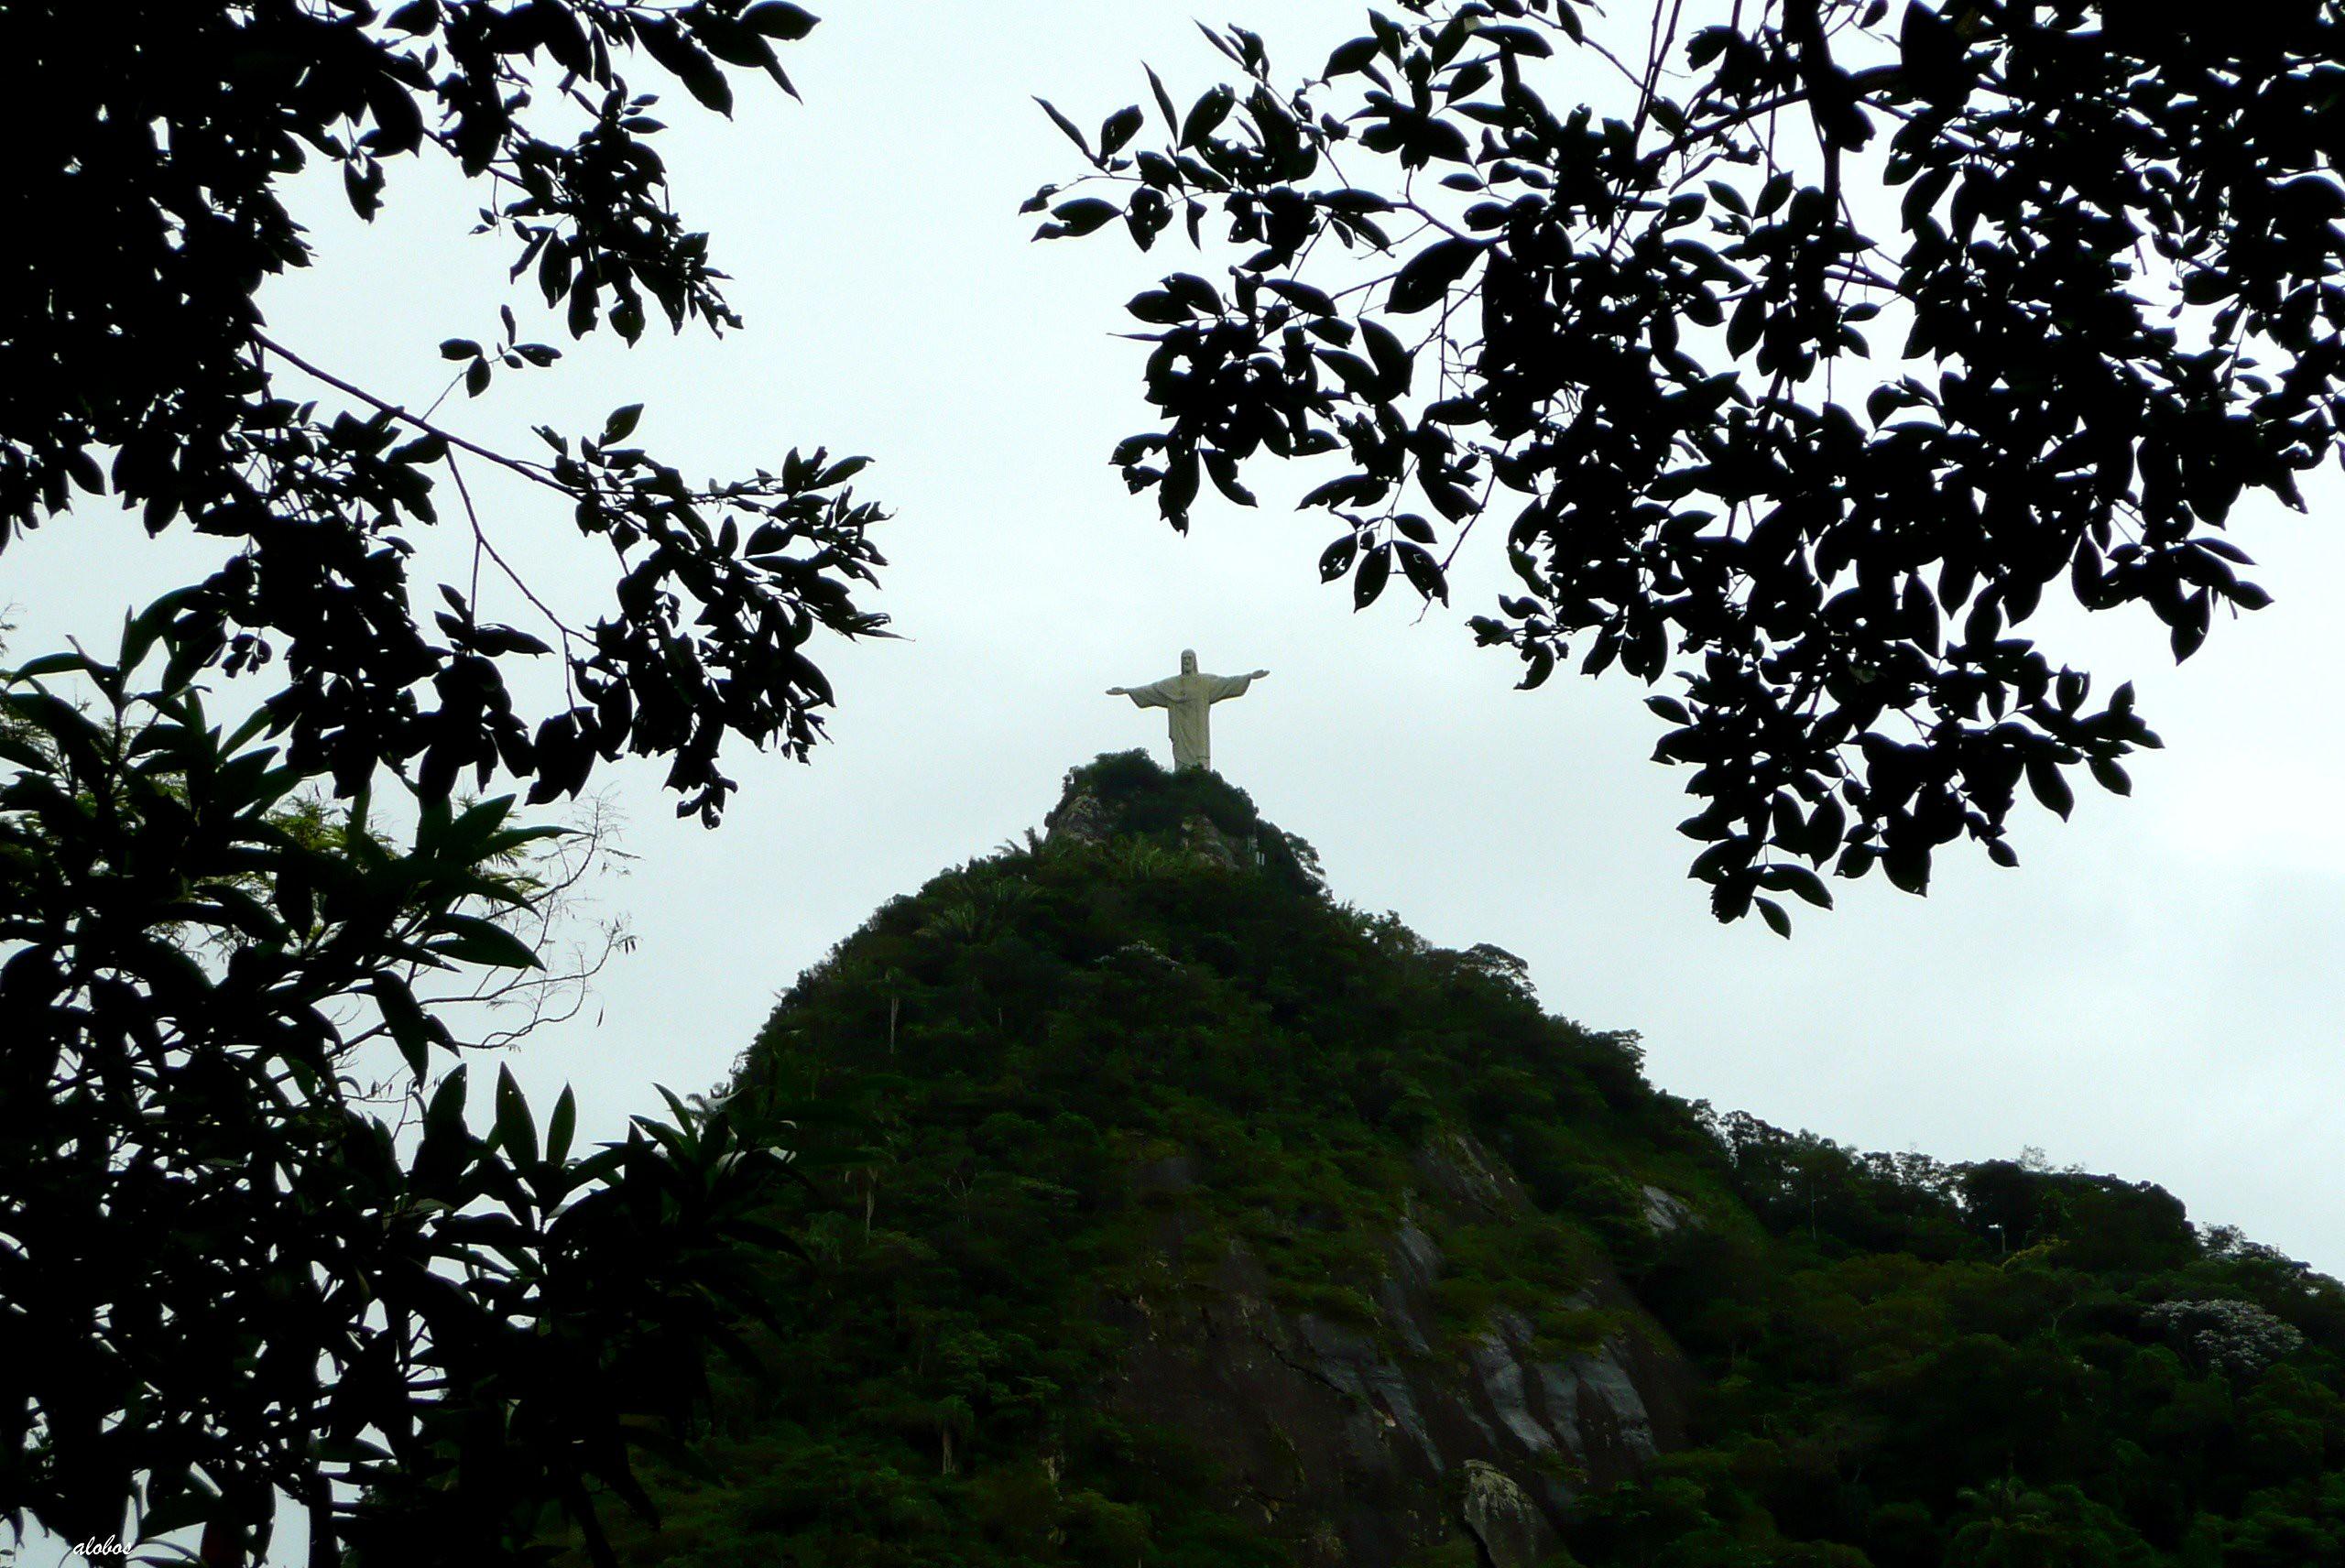 Parque Nacional da Tijuca - Cristo Redentor